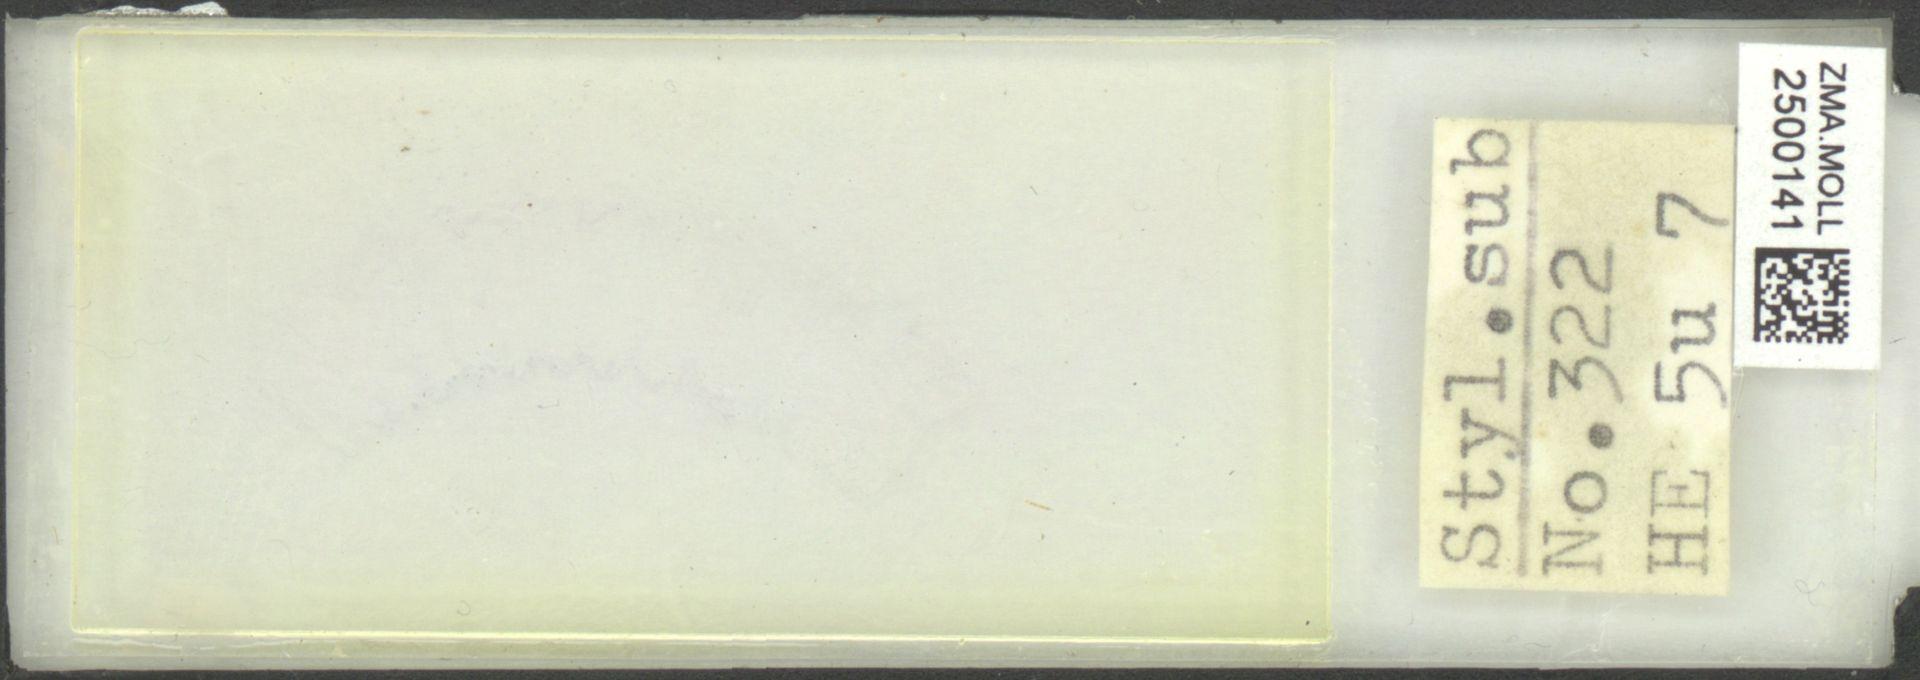 ZMA.MOLL.2500141 | Styliola subula (Quoy & Gaimard, 1827)